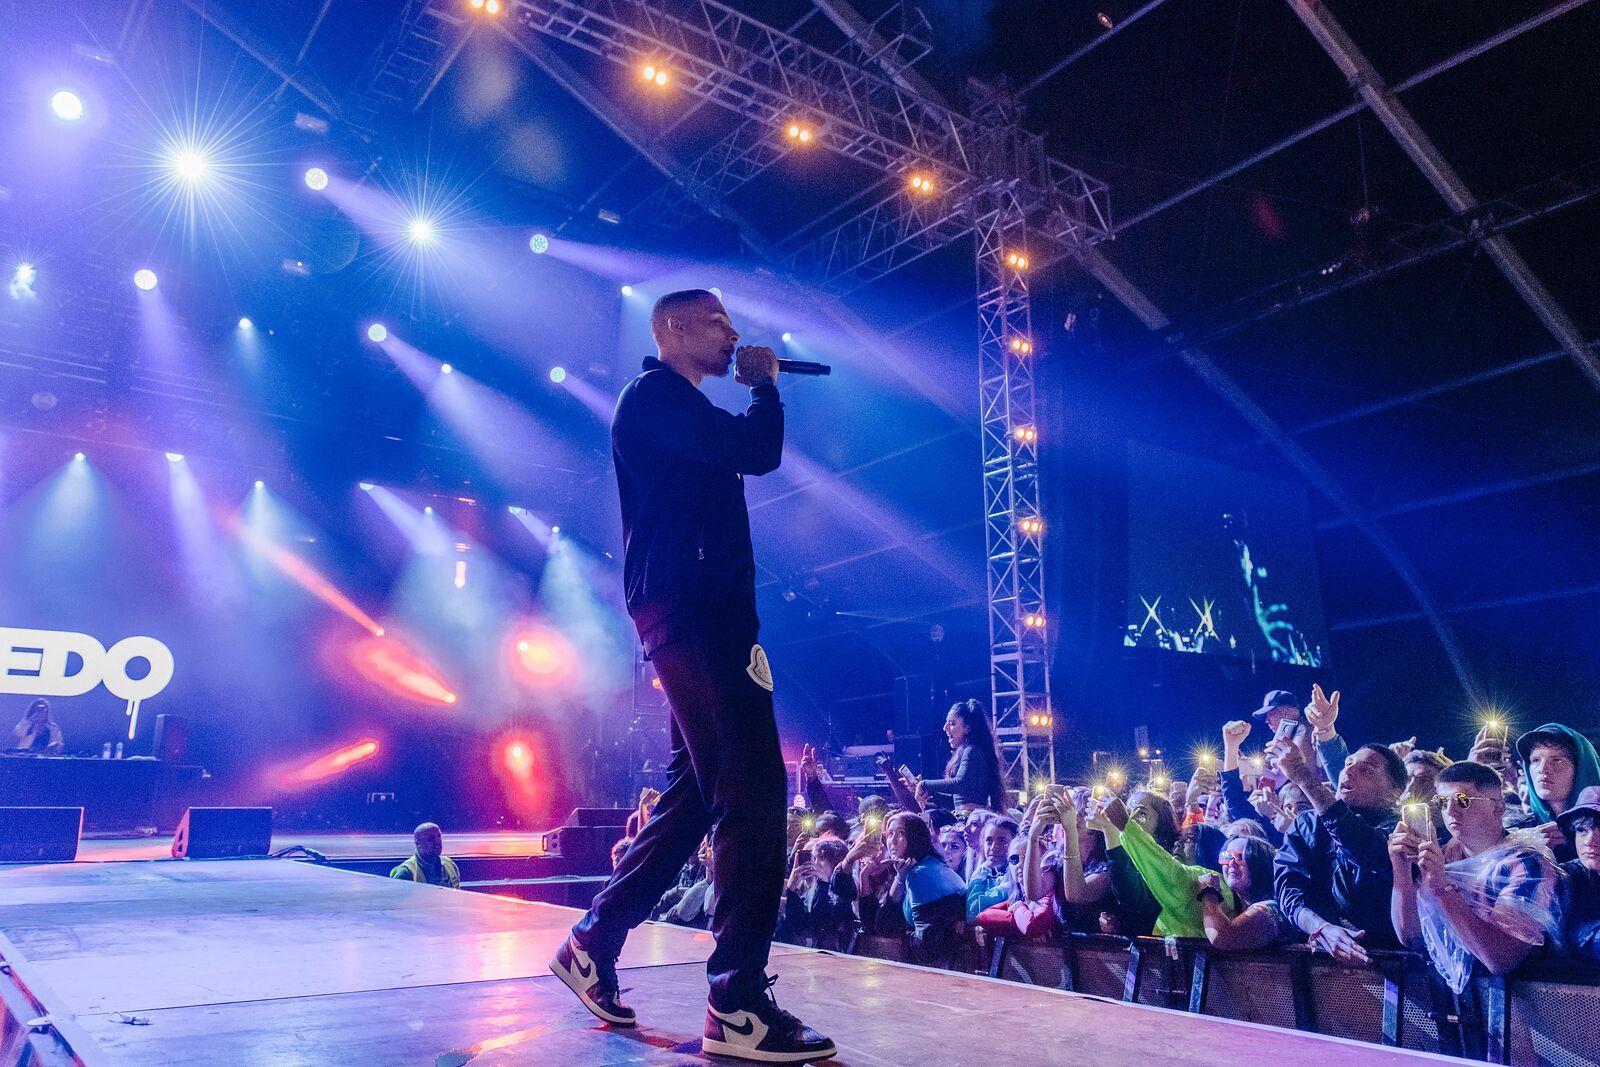 MURKY - Manchester's #1 Hip-Hop & Trap Party